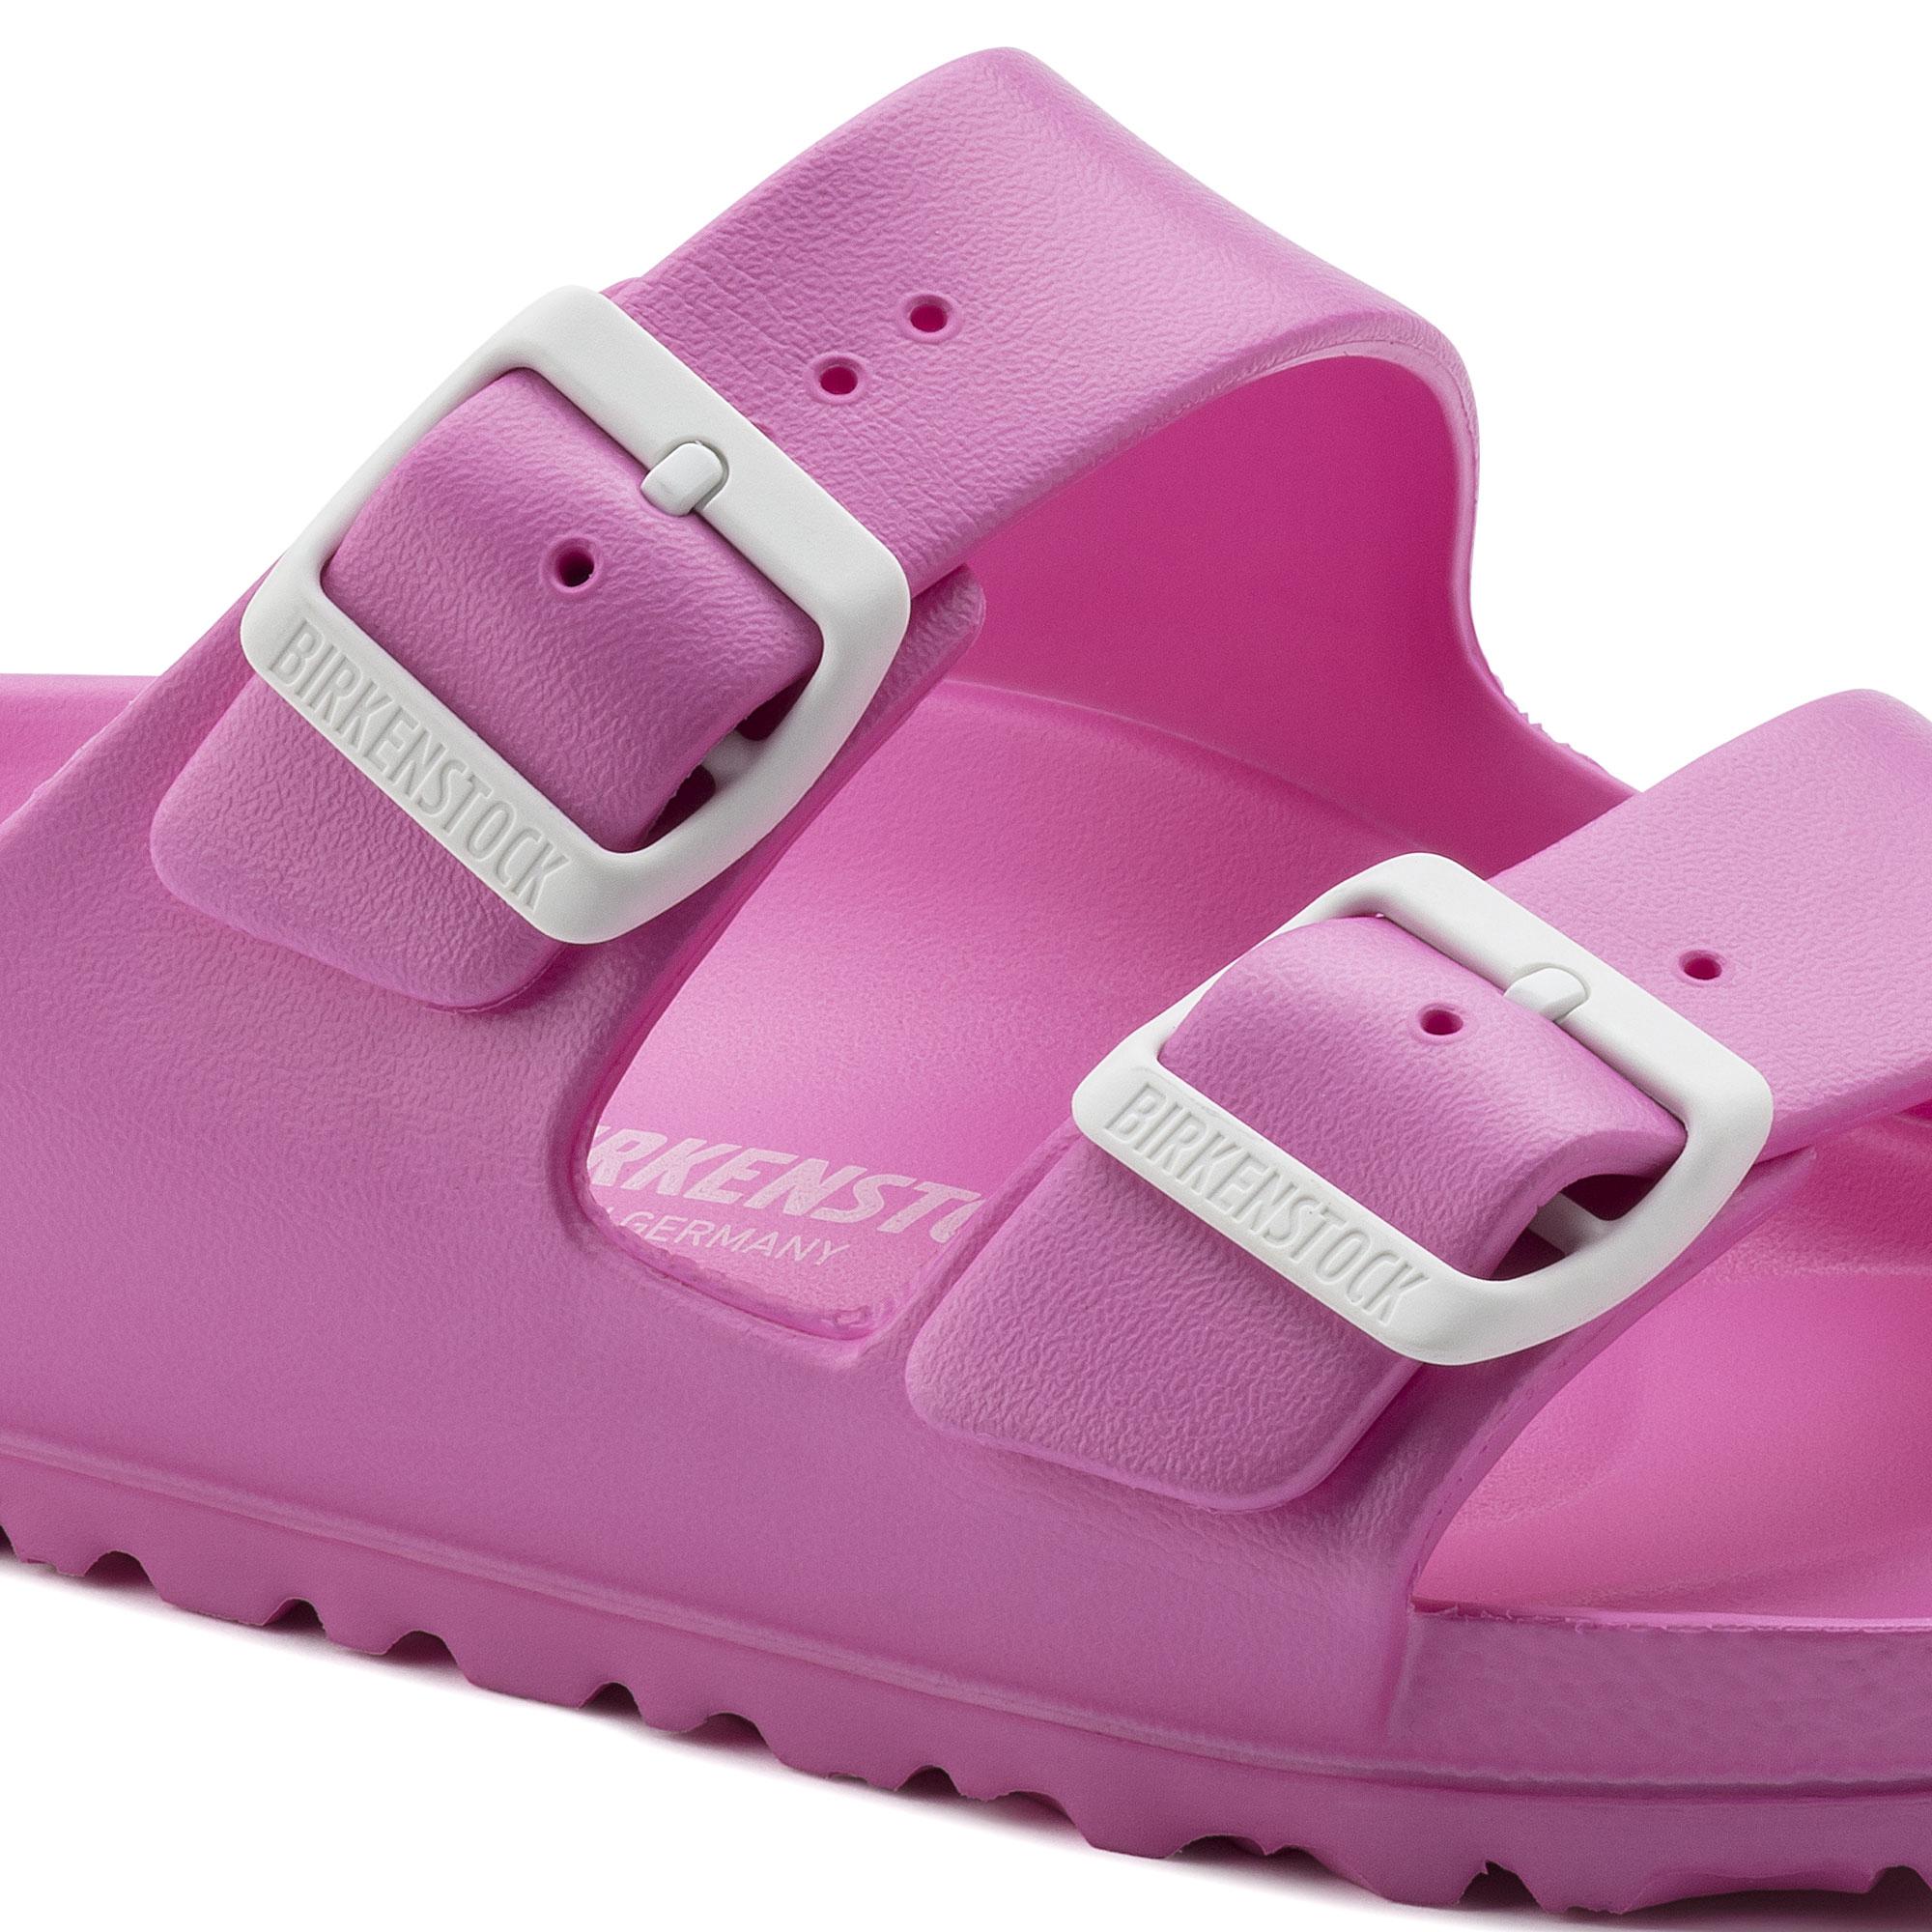 Arizona Eva Neon pink – BIRKENSTOCK PLUS